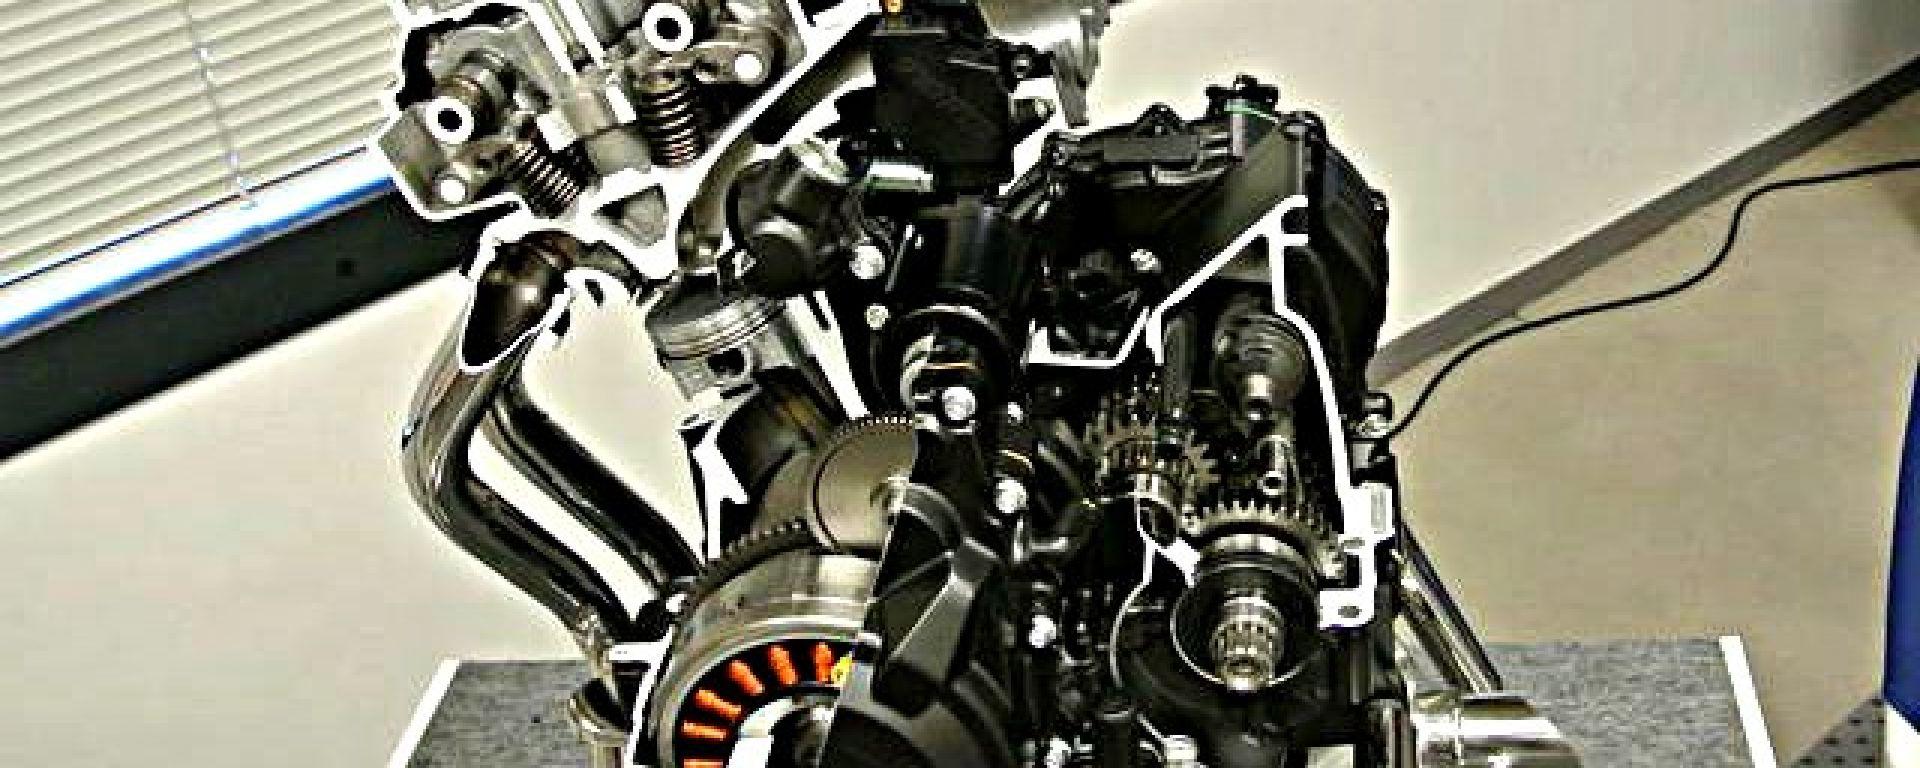 Nuovo motore Honda 400 cc